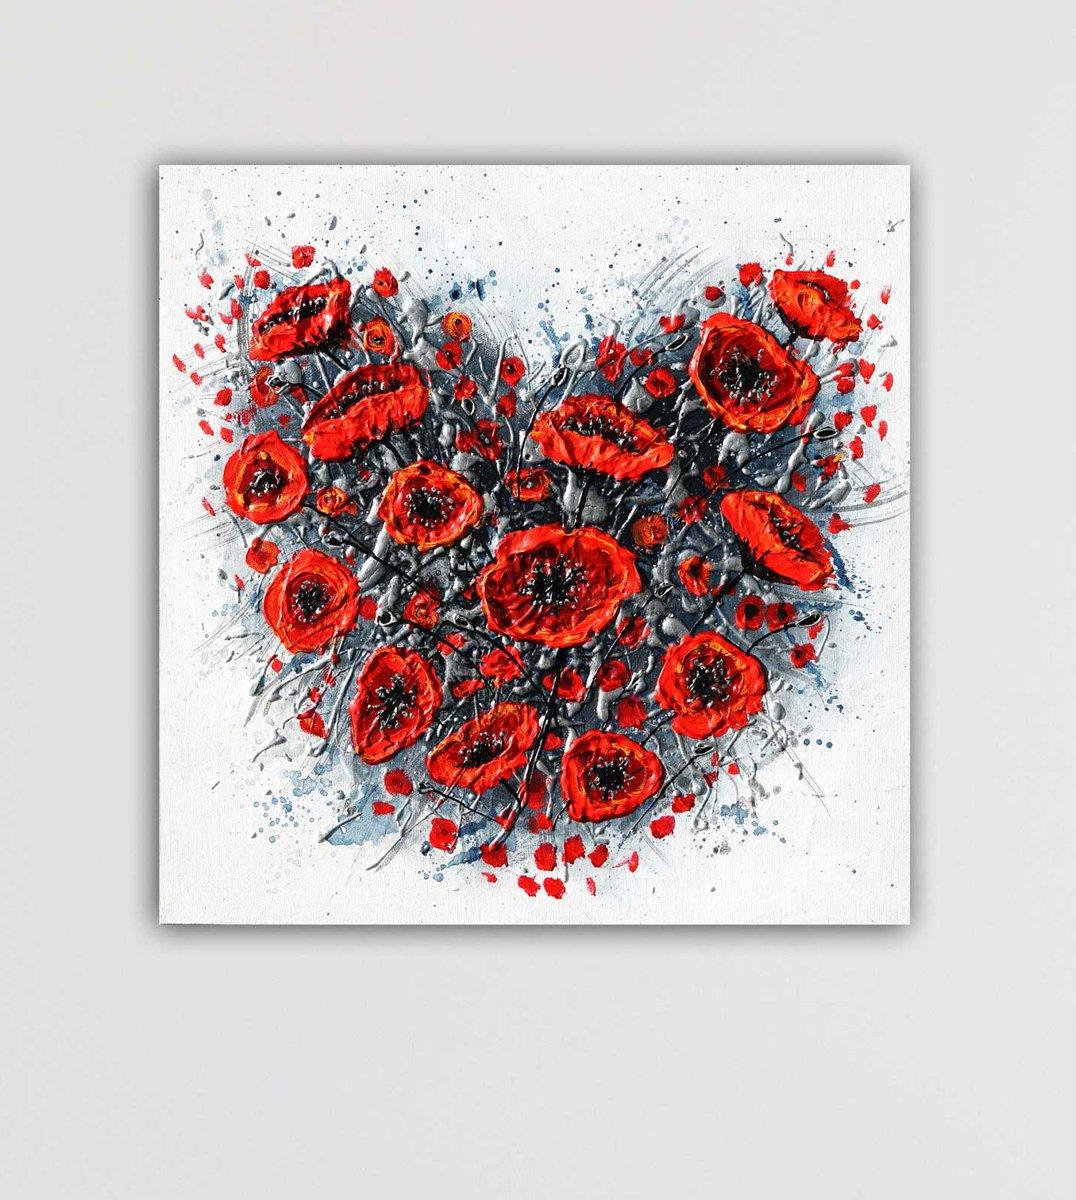 "New painting titled ""Love"" Now SOLD🔴 16x16 painting on canvas https://t.co/P6OxVHskTZ #heart #heartpainting #redpoppies #poppies #poppyflowers #poppypainting #originalpainting #art4sale #texturedpainting #thickpaint #impastoart #impasto #sharethelove #amandadagg https://t.co/ZSzN2EJn5C"